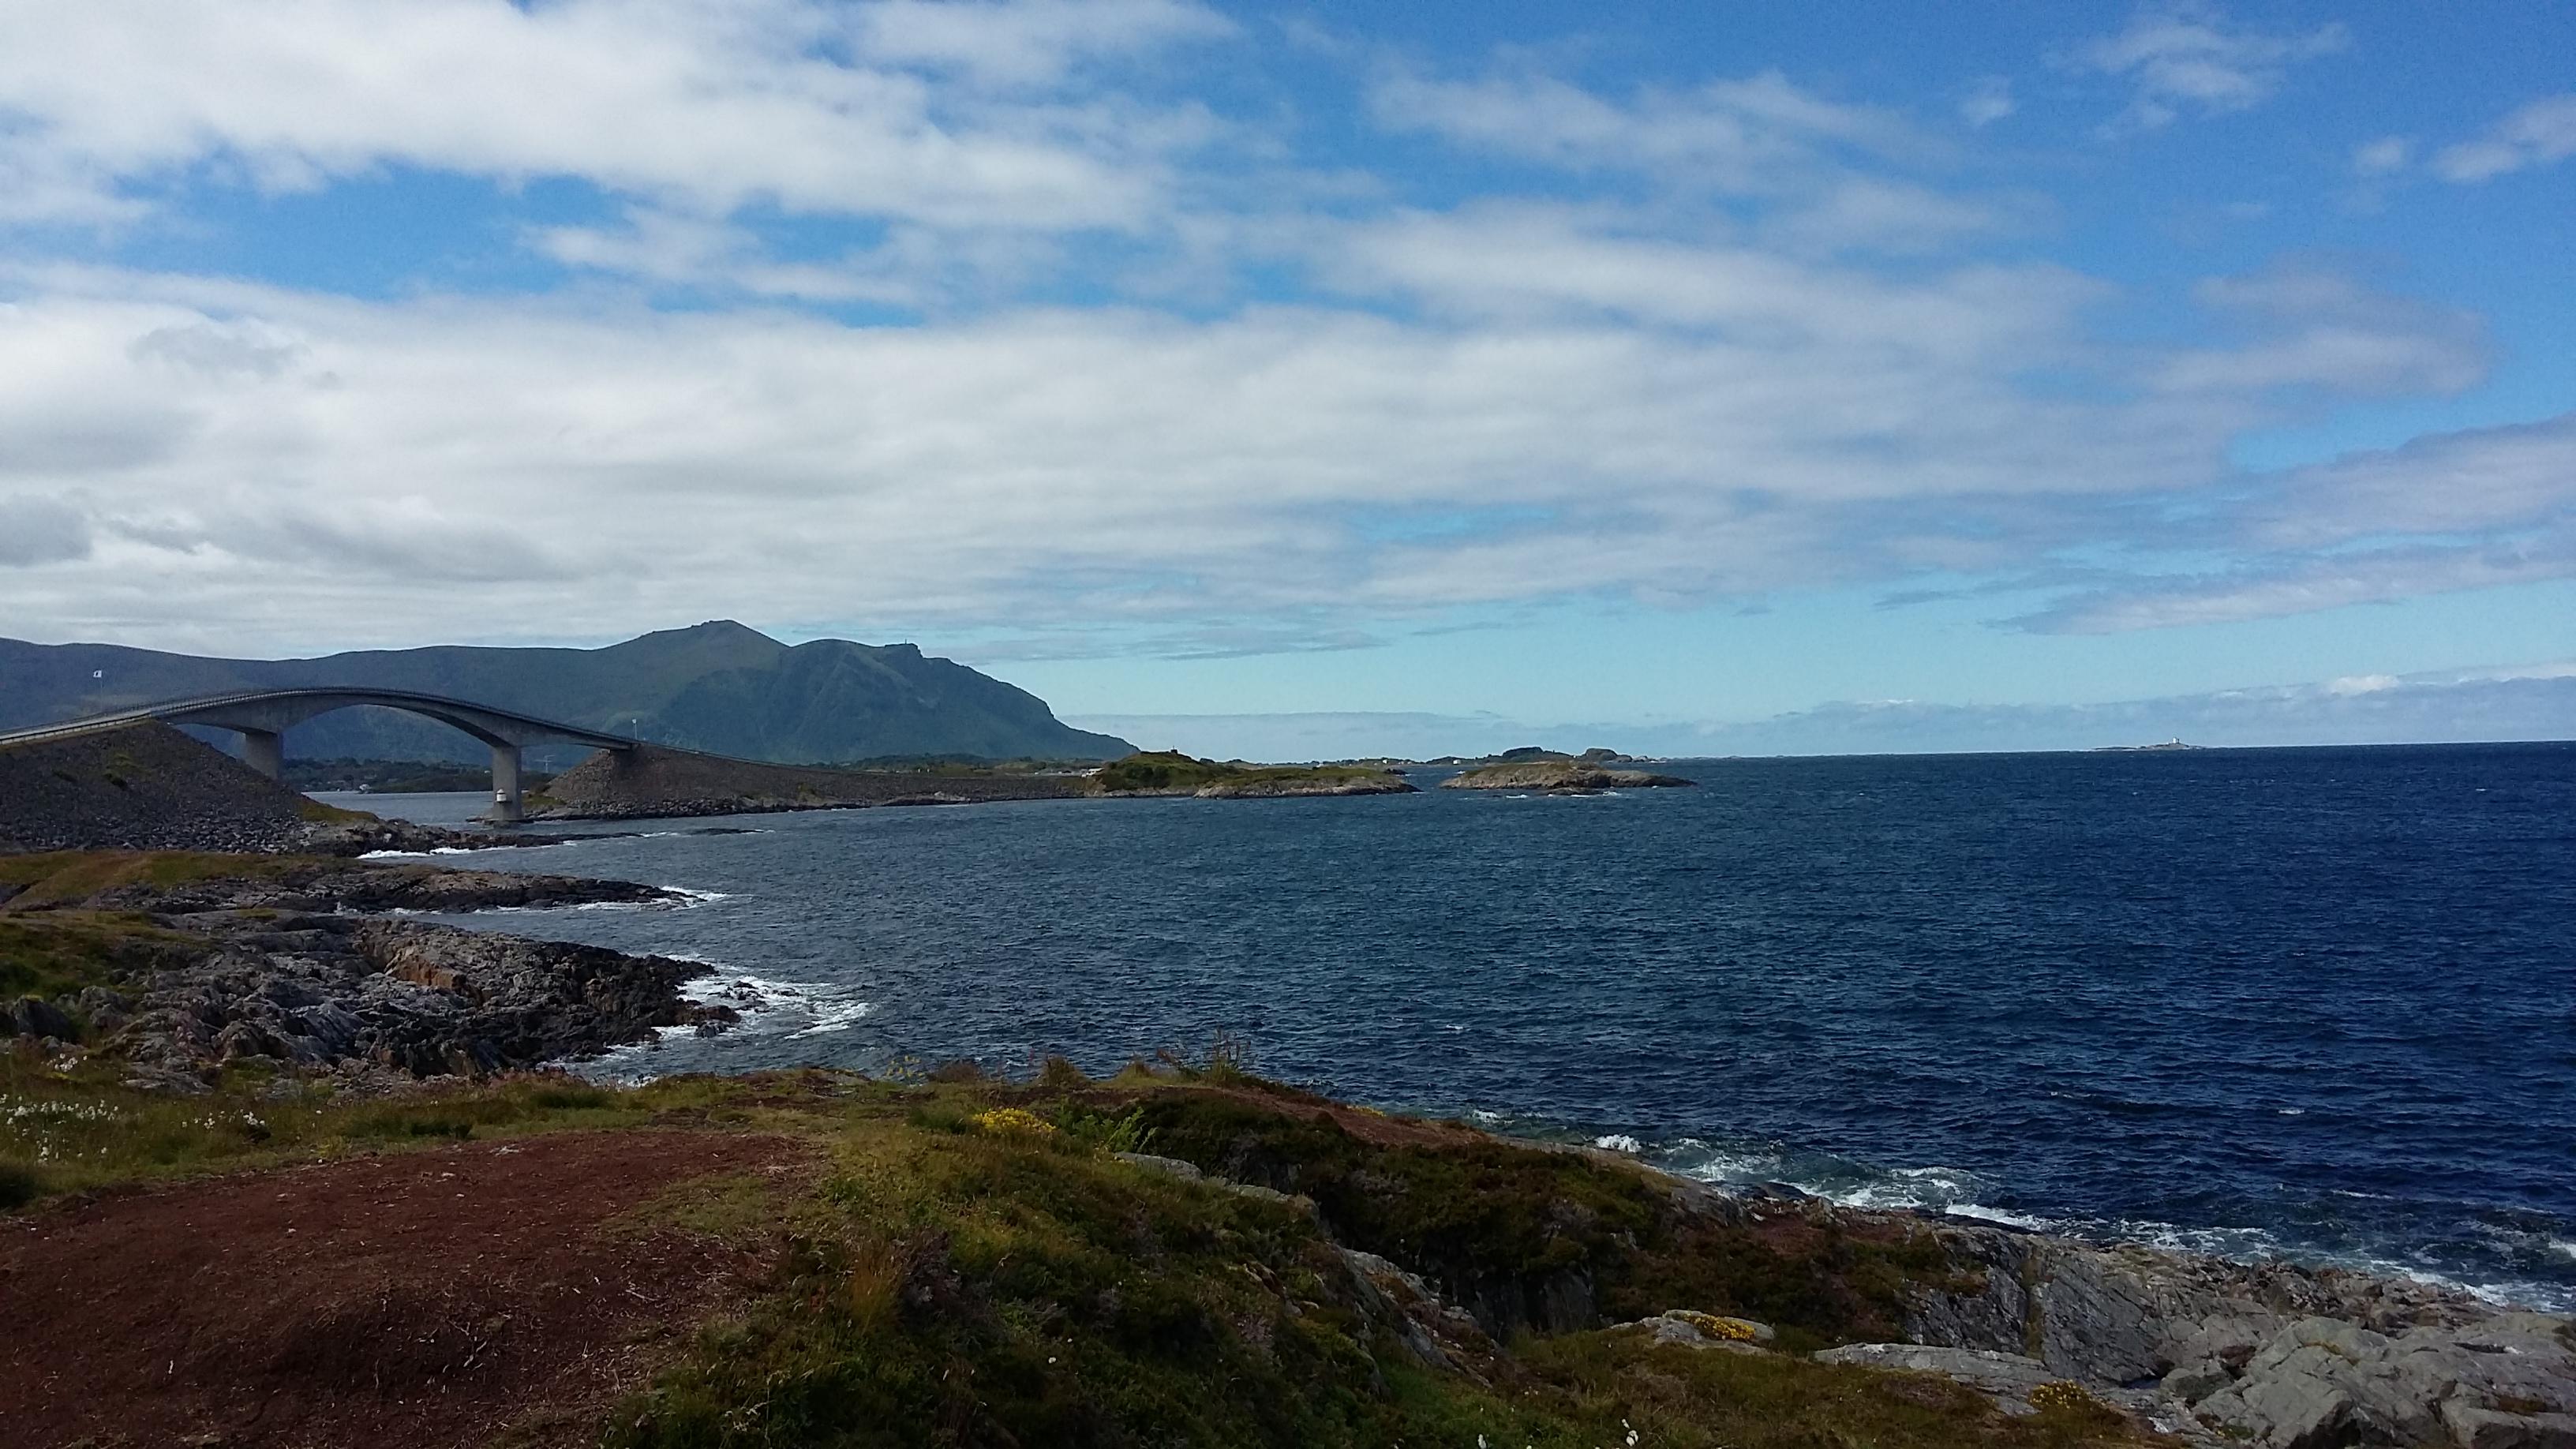 volvos.lt/images/Publikavimui/Norge/20160706_123703.jpg